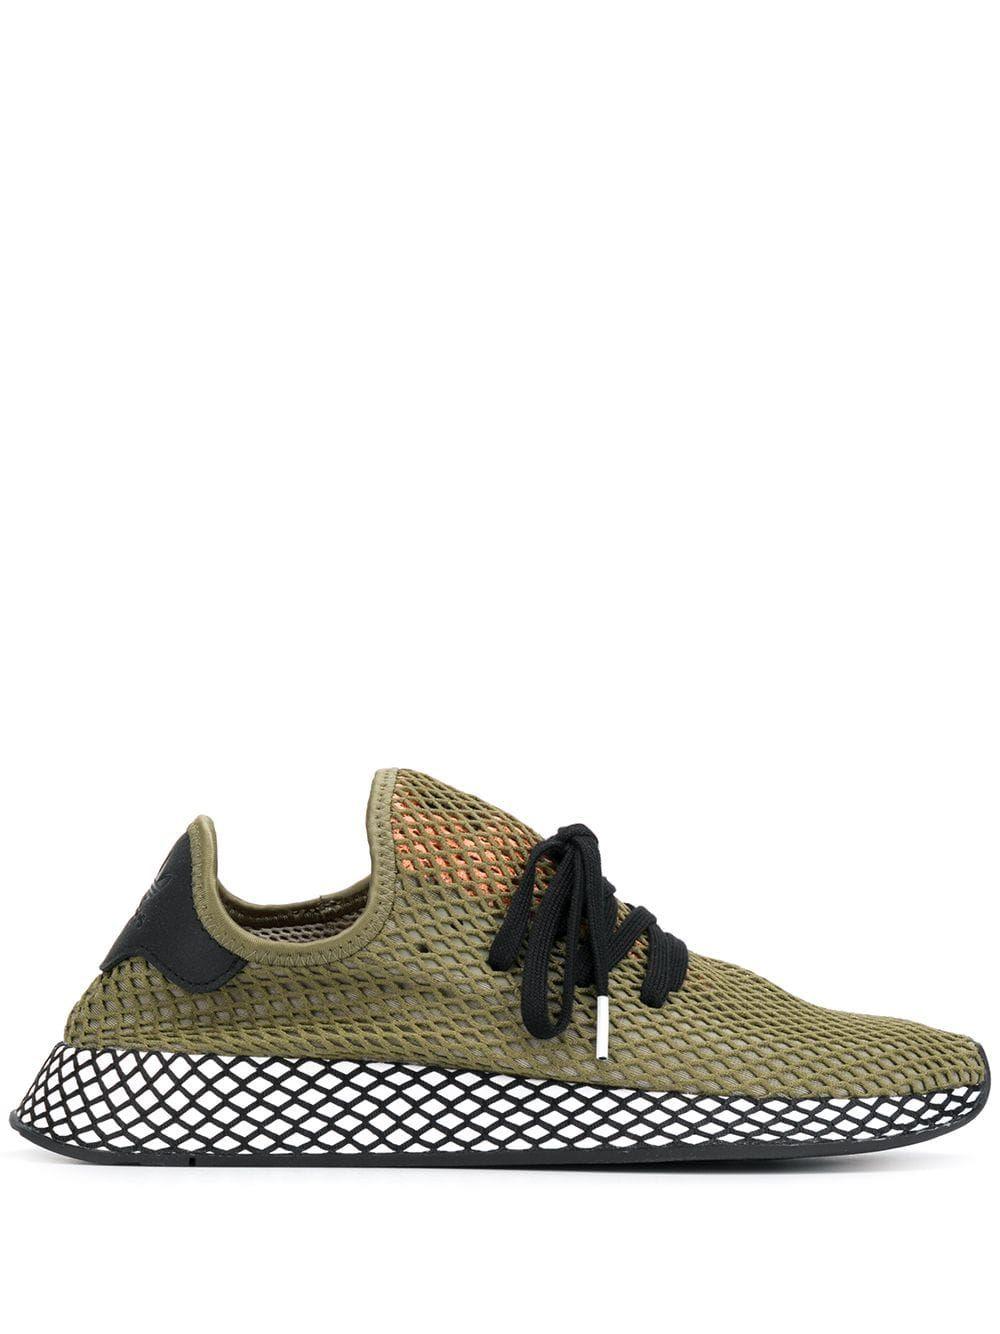 ac1640306 ADIDAS ORIGINALS ADIDAS DEERUPT RUNNER SNEAKERS - GREEN.  adidasoriginals   shoes